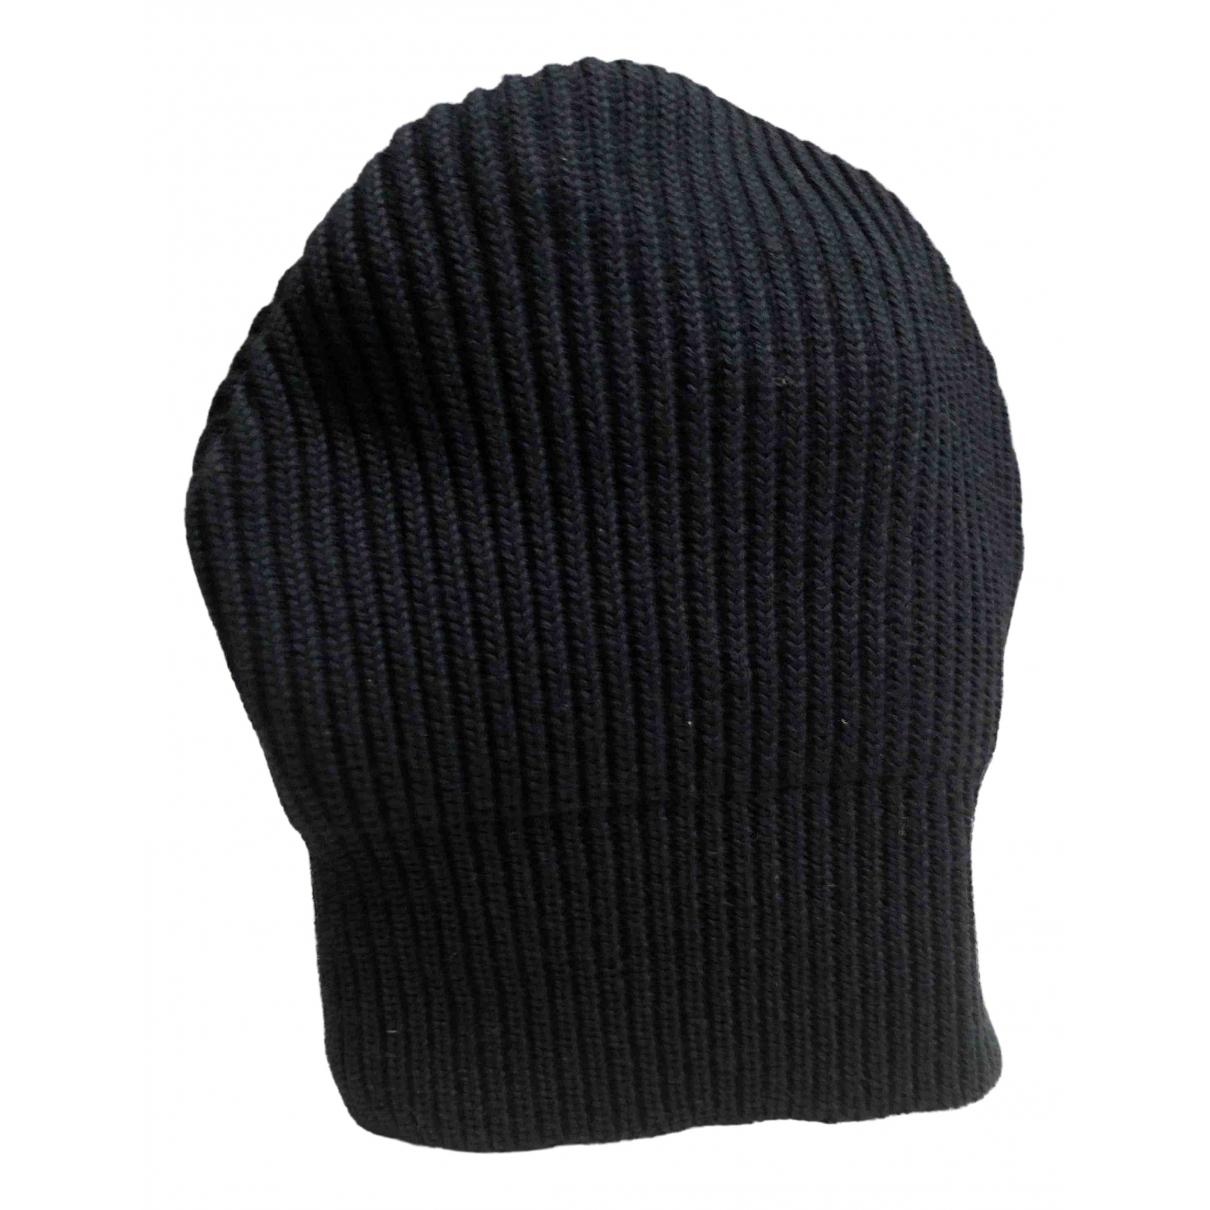 Sombrero / gorro de Lana Maison Martin Margiela